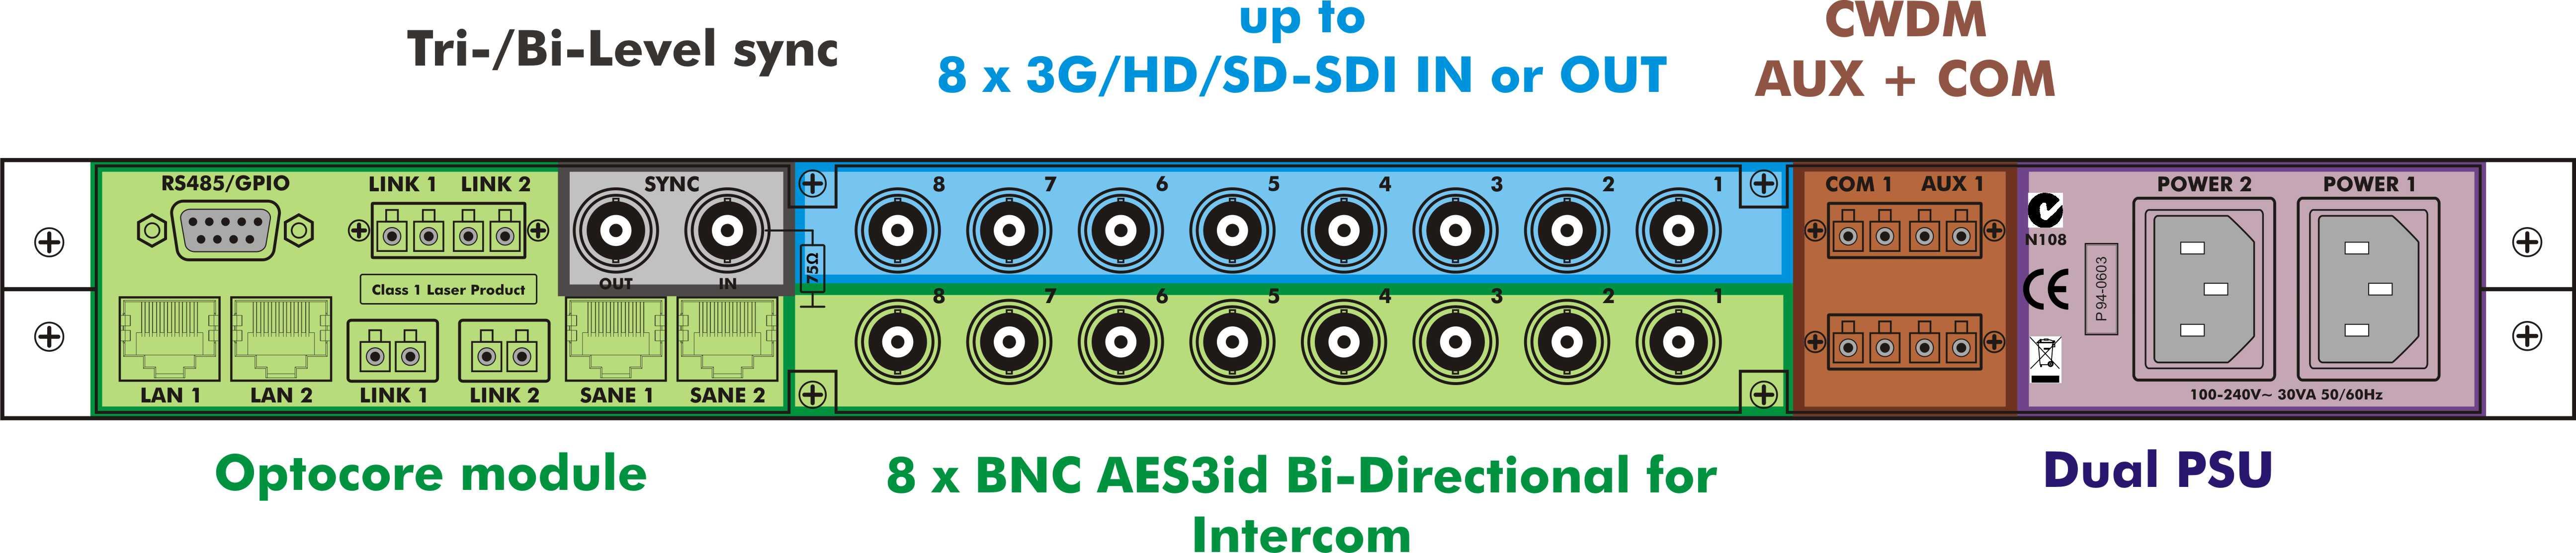 Конвертер мультимедиа Mux22-IVT/ICBNC BroaMan вид сзади